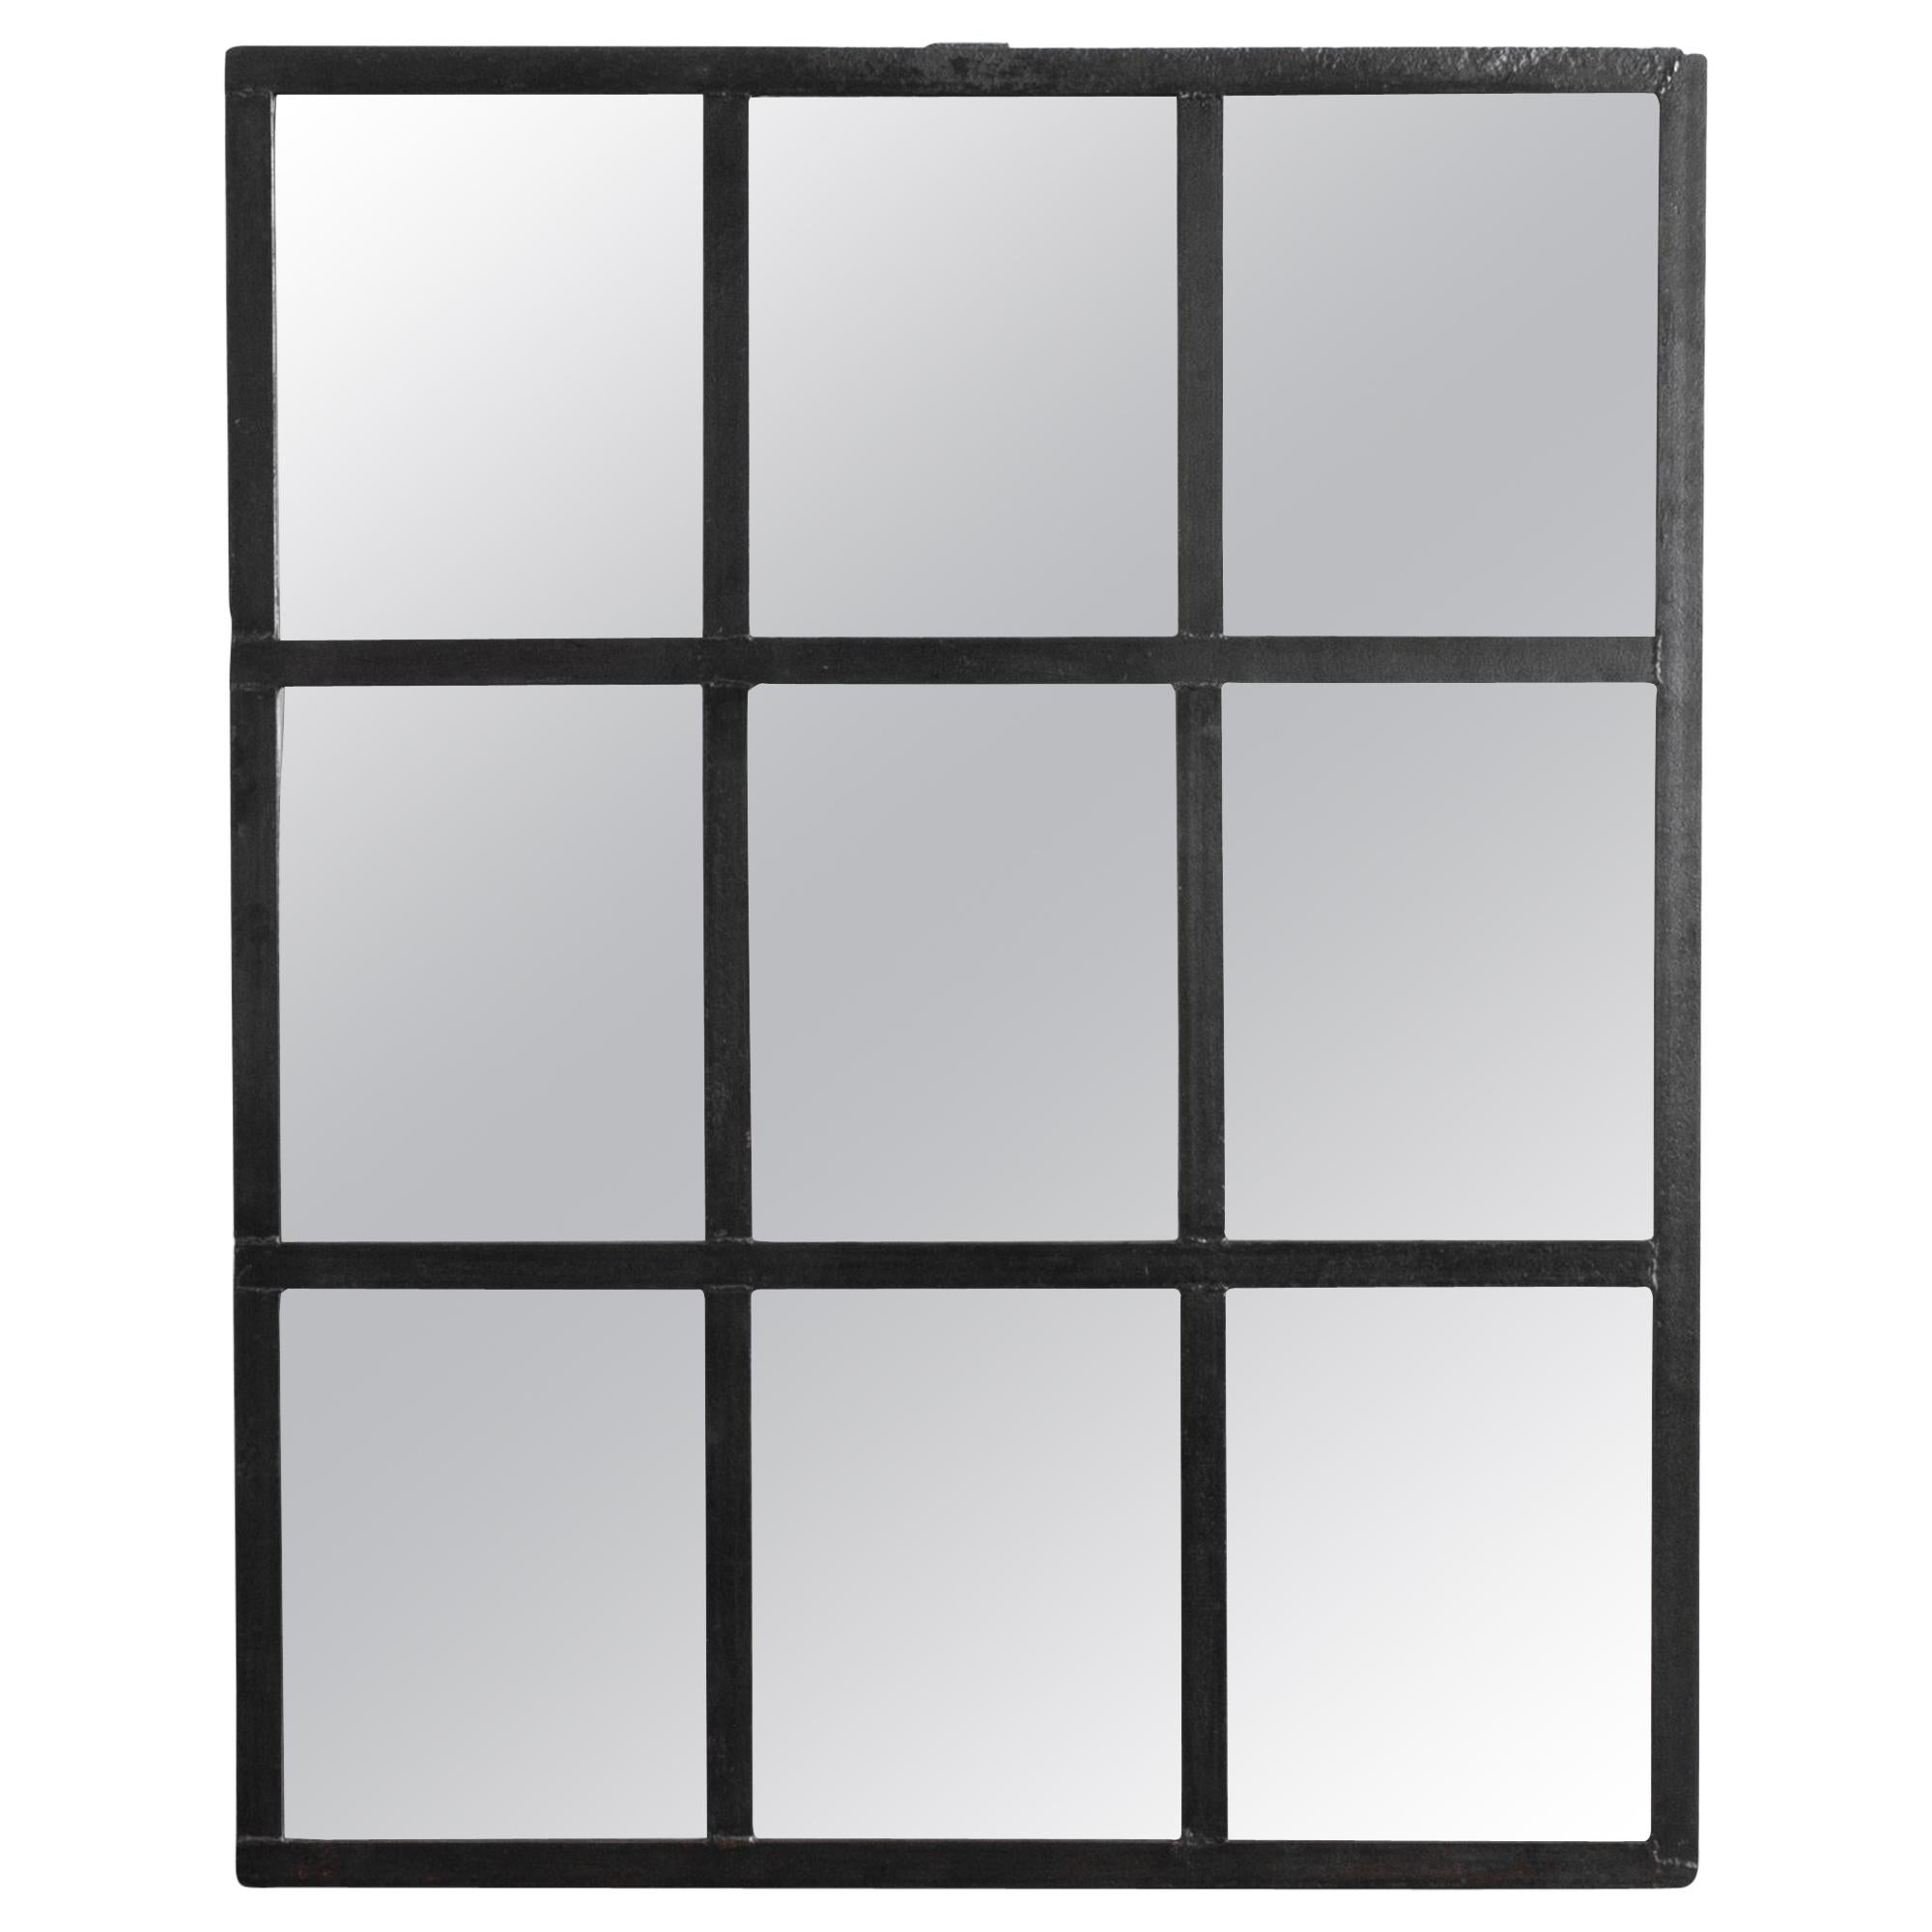 1950s Czech Mirrored Factory Window